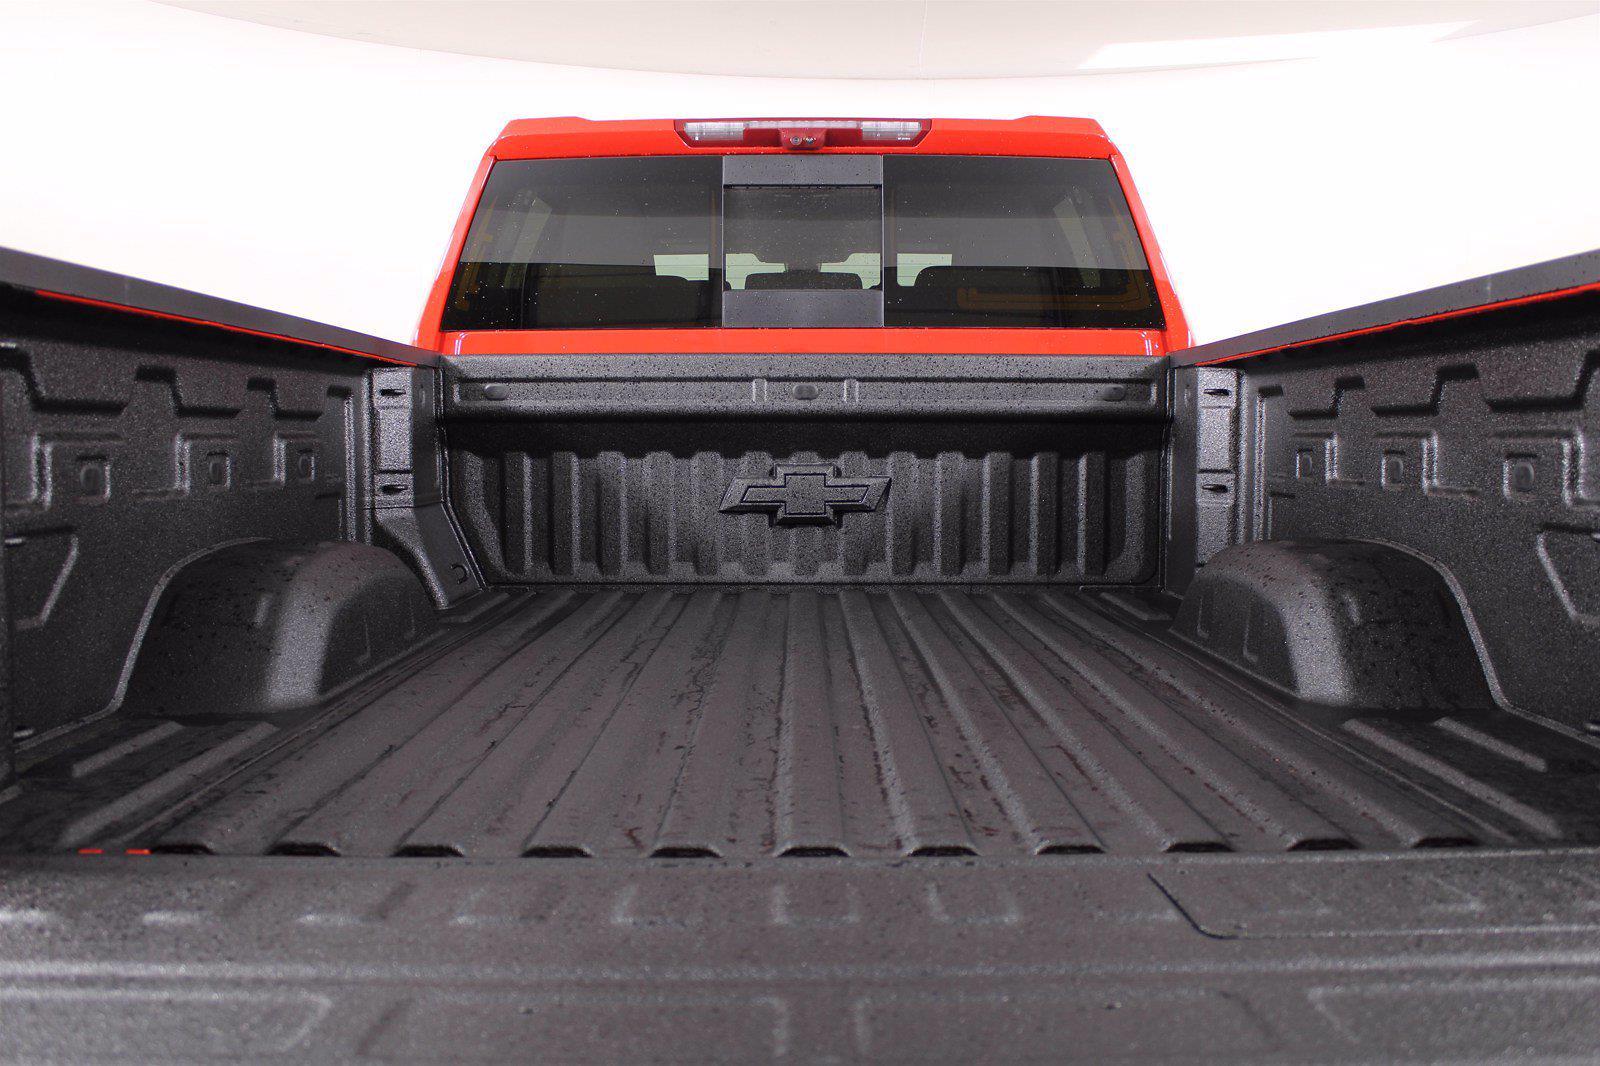 2021 Chevrolet Silverado 2500 Crew Cab 4x4, Pickup #D110744 - photo 9